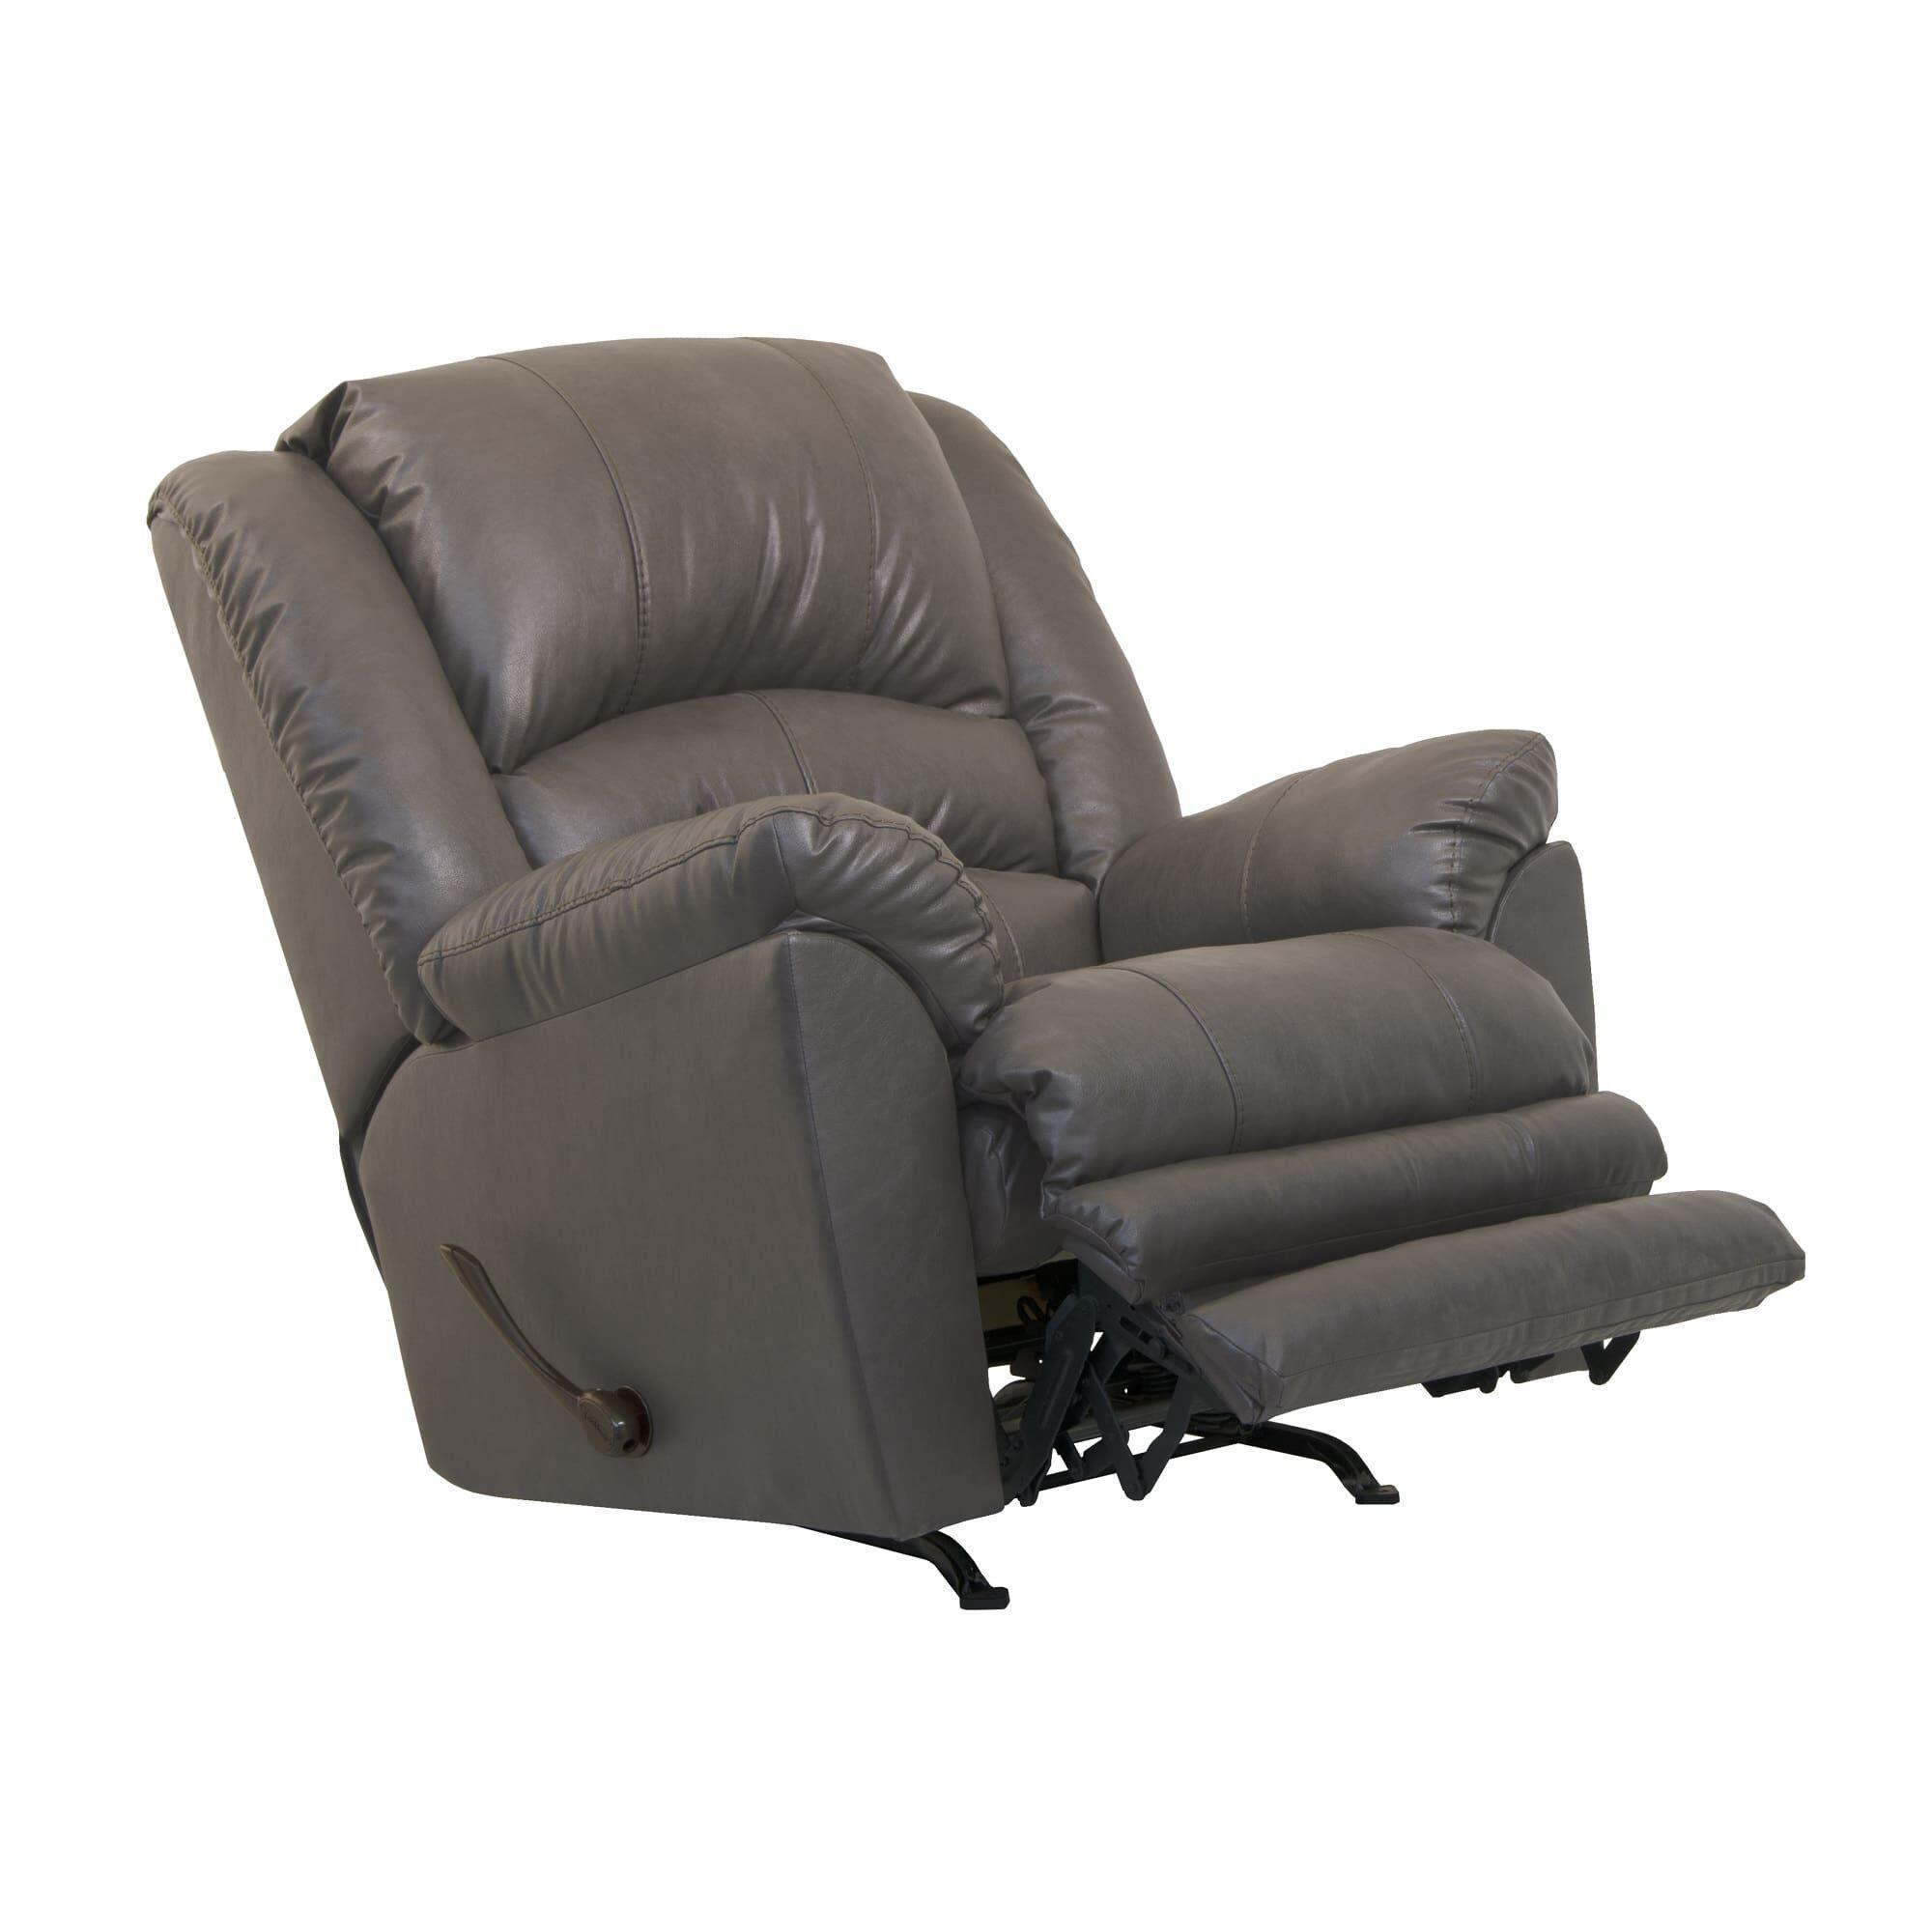 big man chairs swing chair dwg jackson furniture recliners rocker recliner